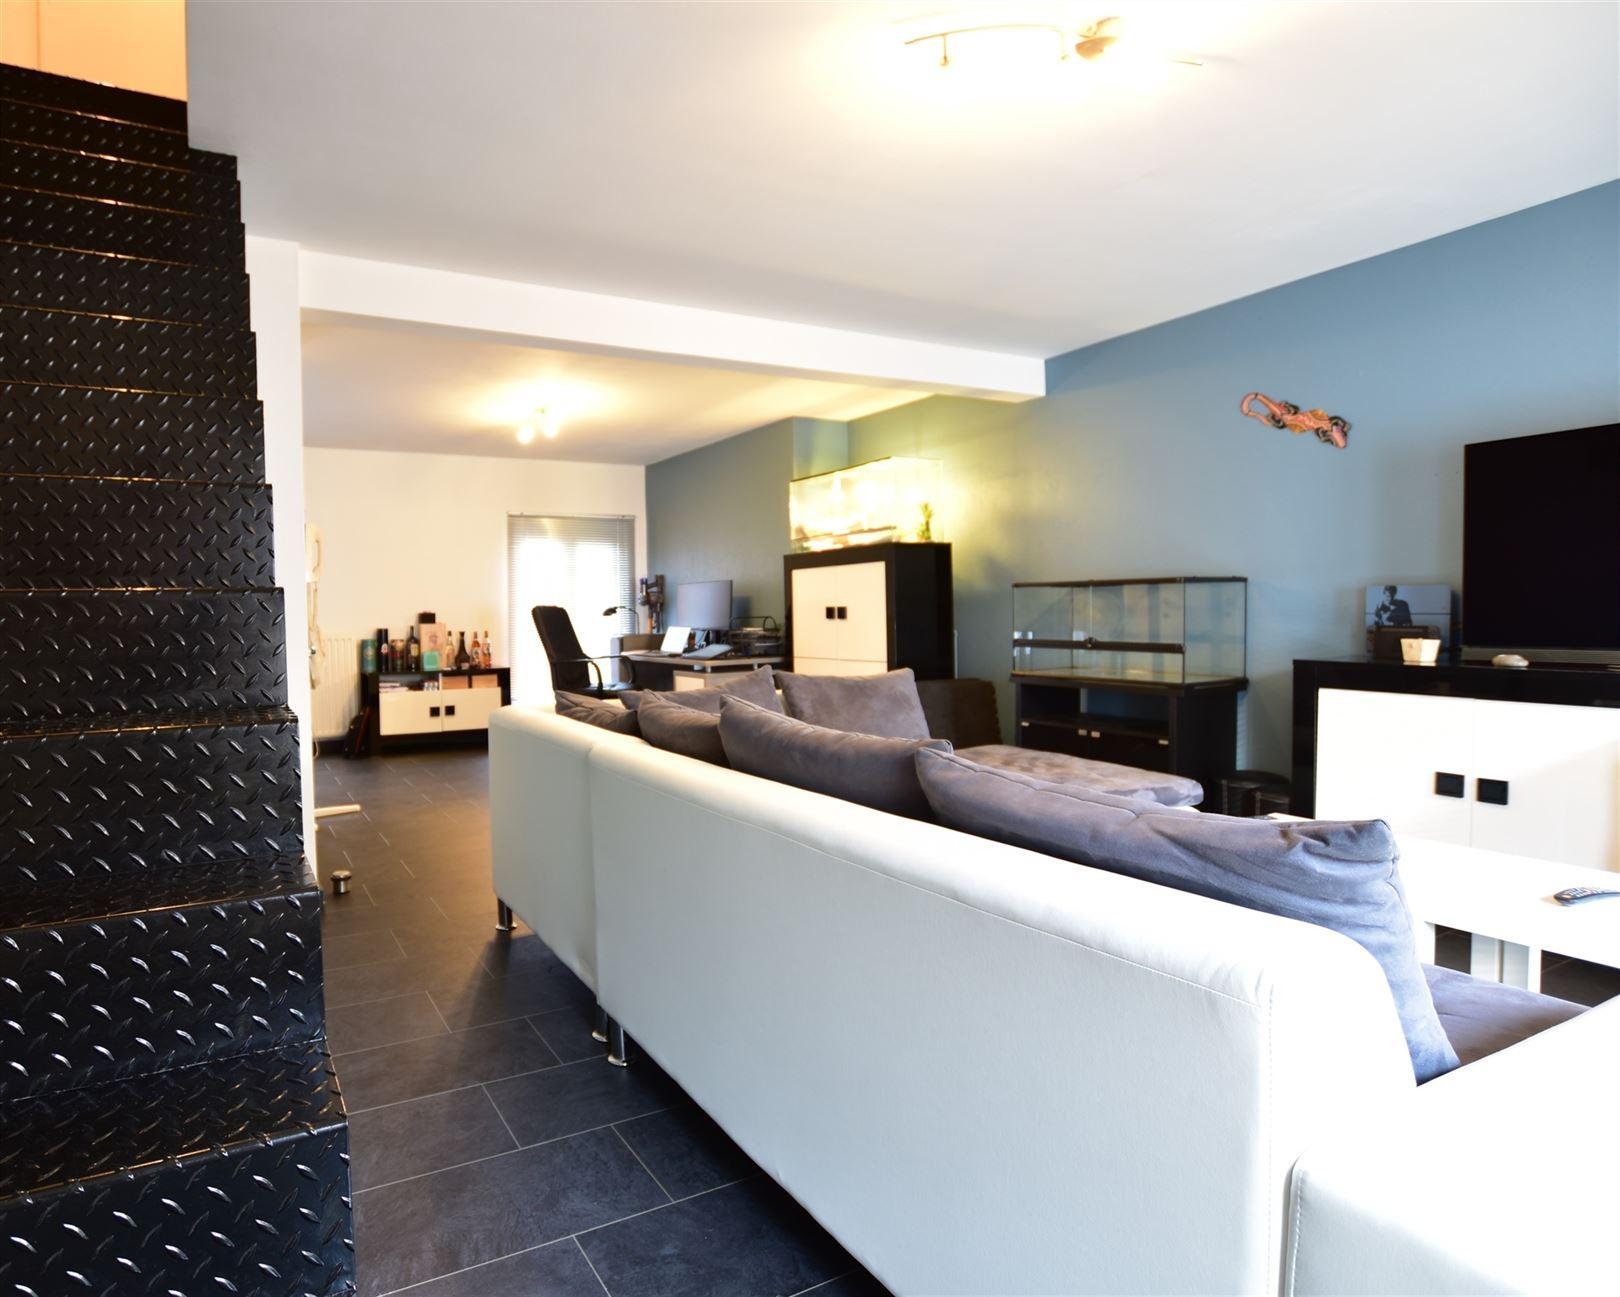 Foto 4 : Duplex/triplex te 9200 BAASRODE (België) - Prijs € 159.000